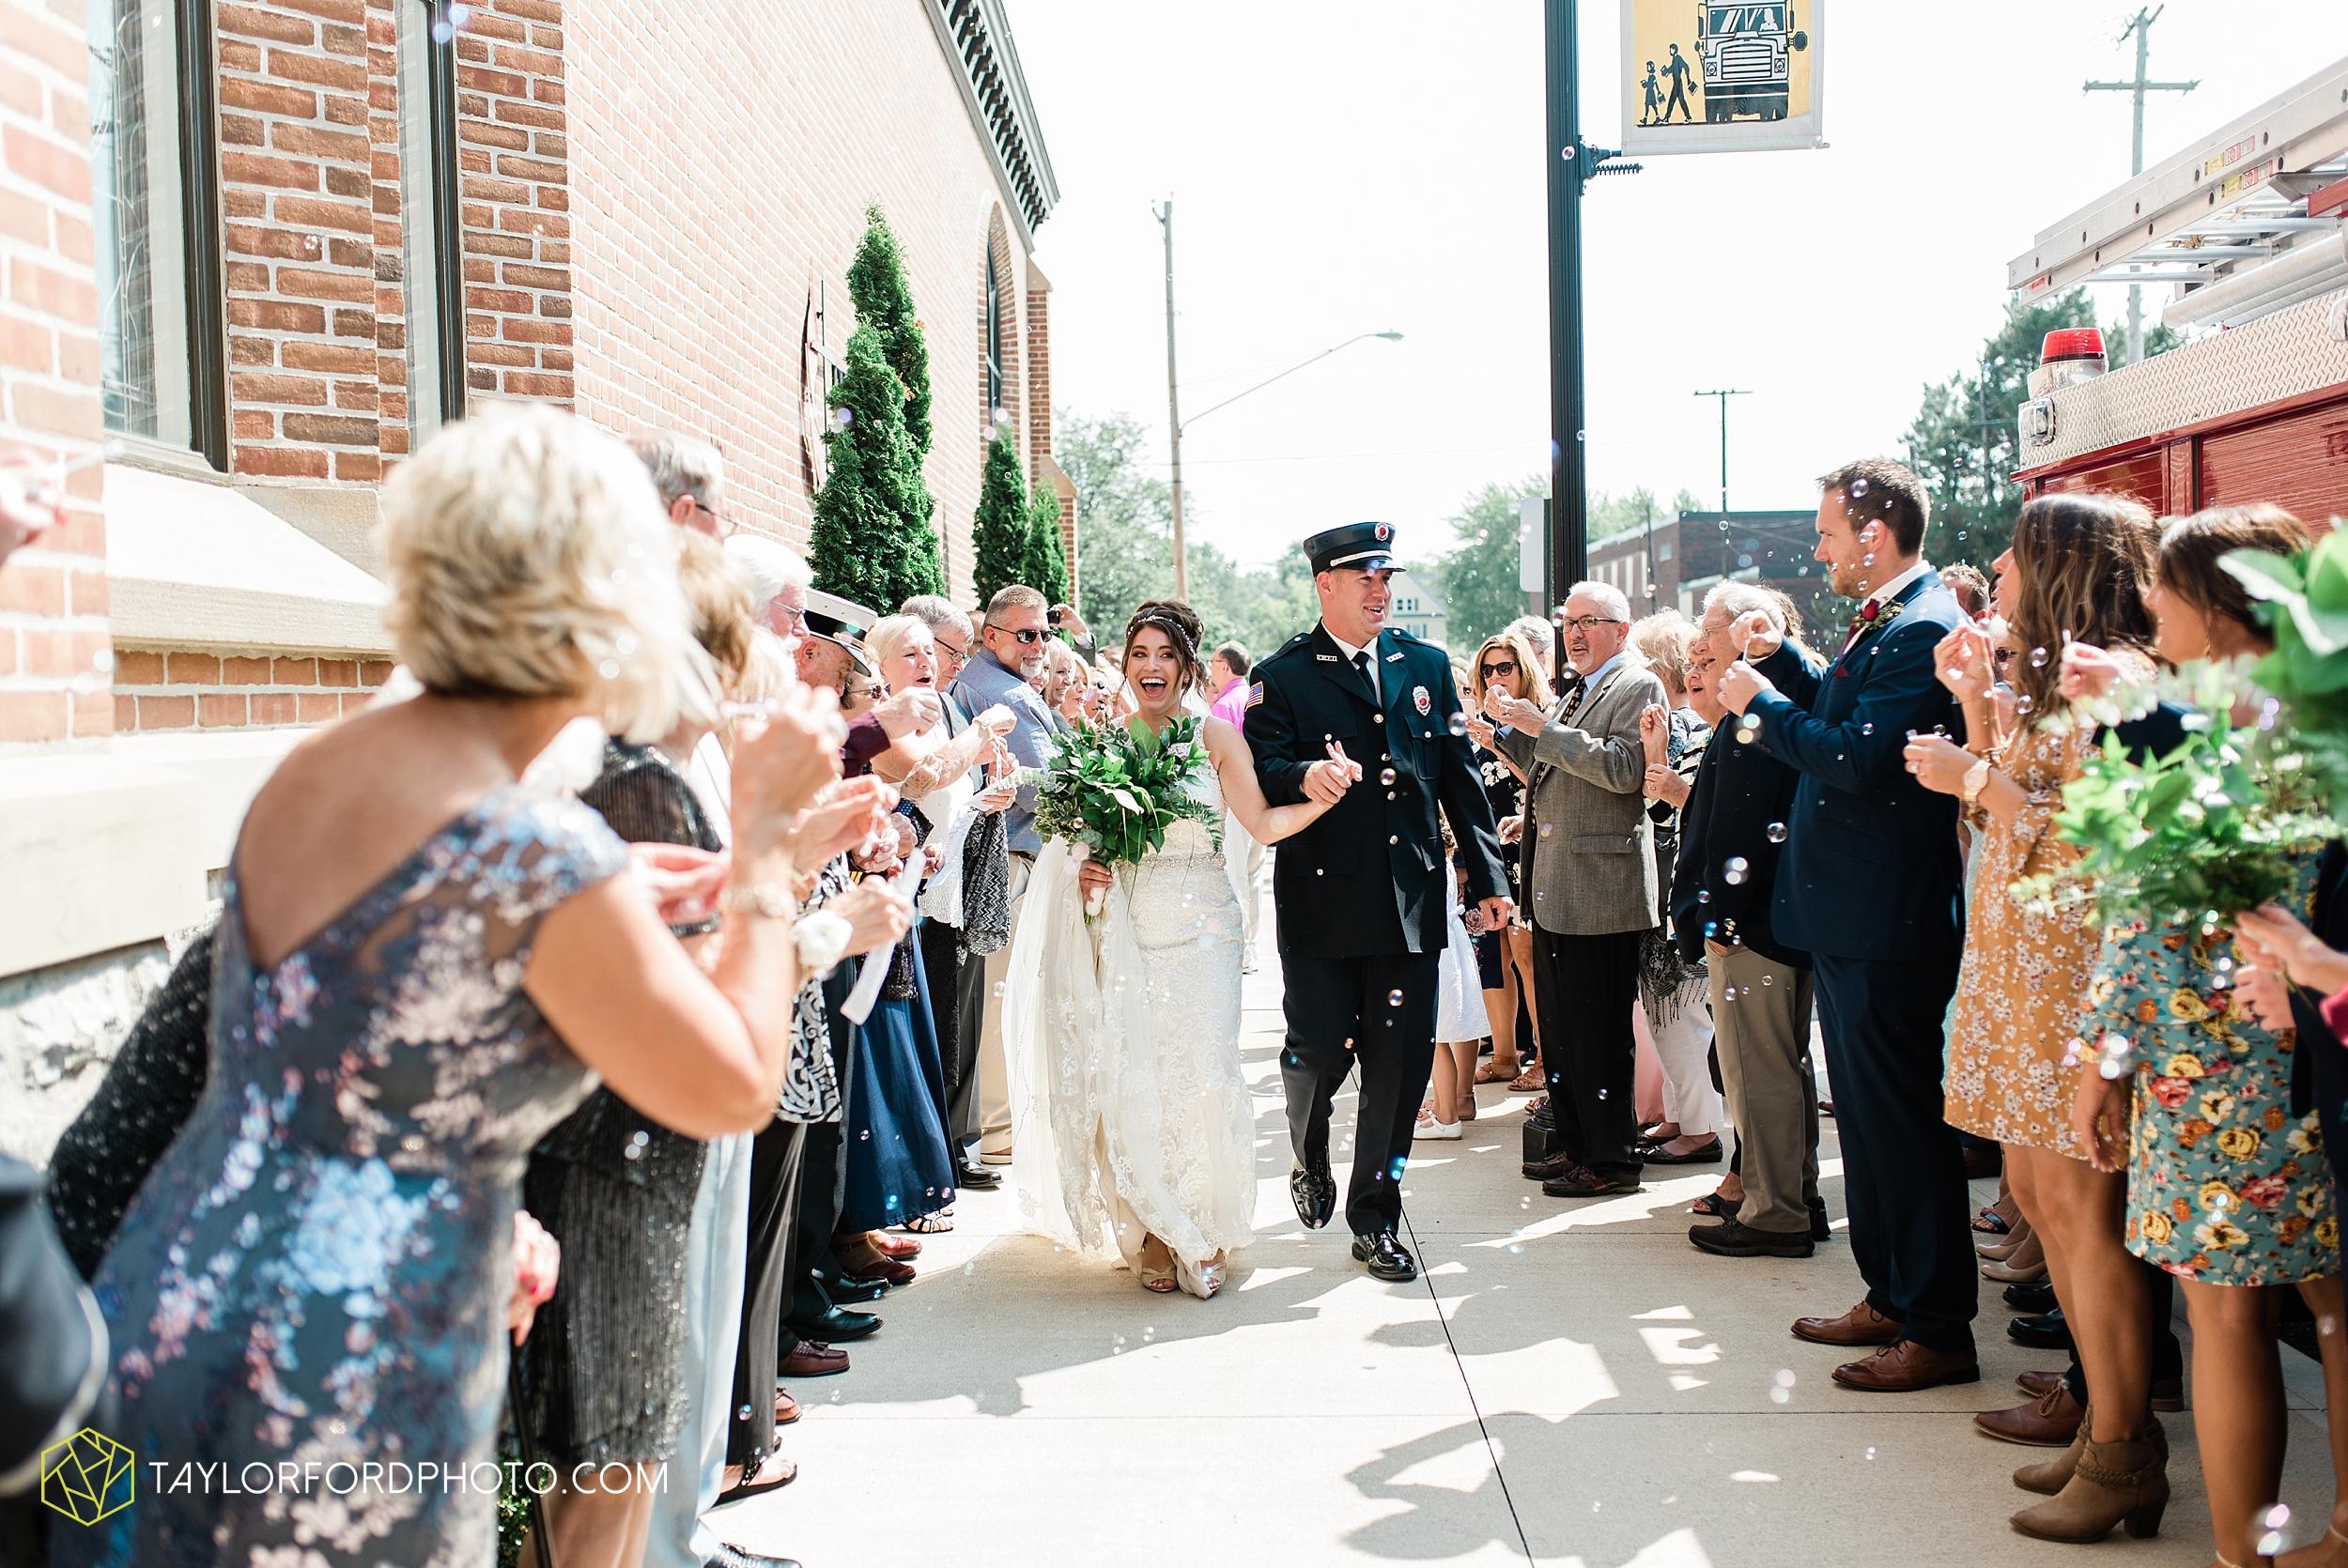 van-wert-ohio-first-united-methodist-church-county-dairy-barn-wedding-photographer-taylor-ford-photography_9839.jpg